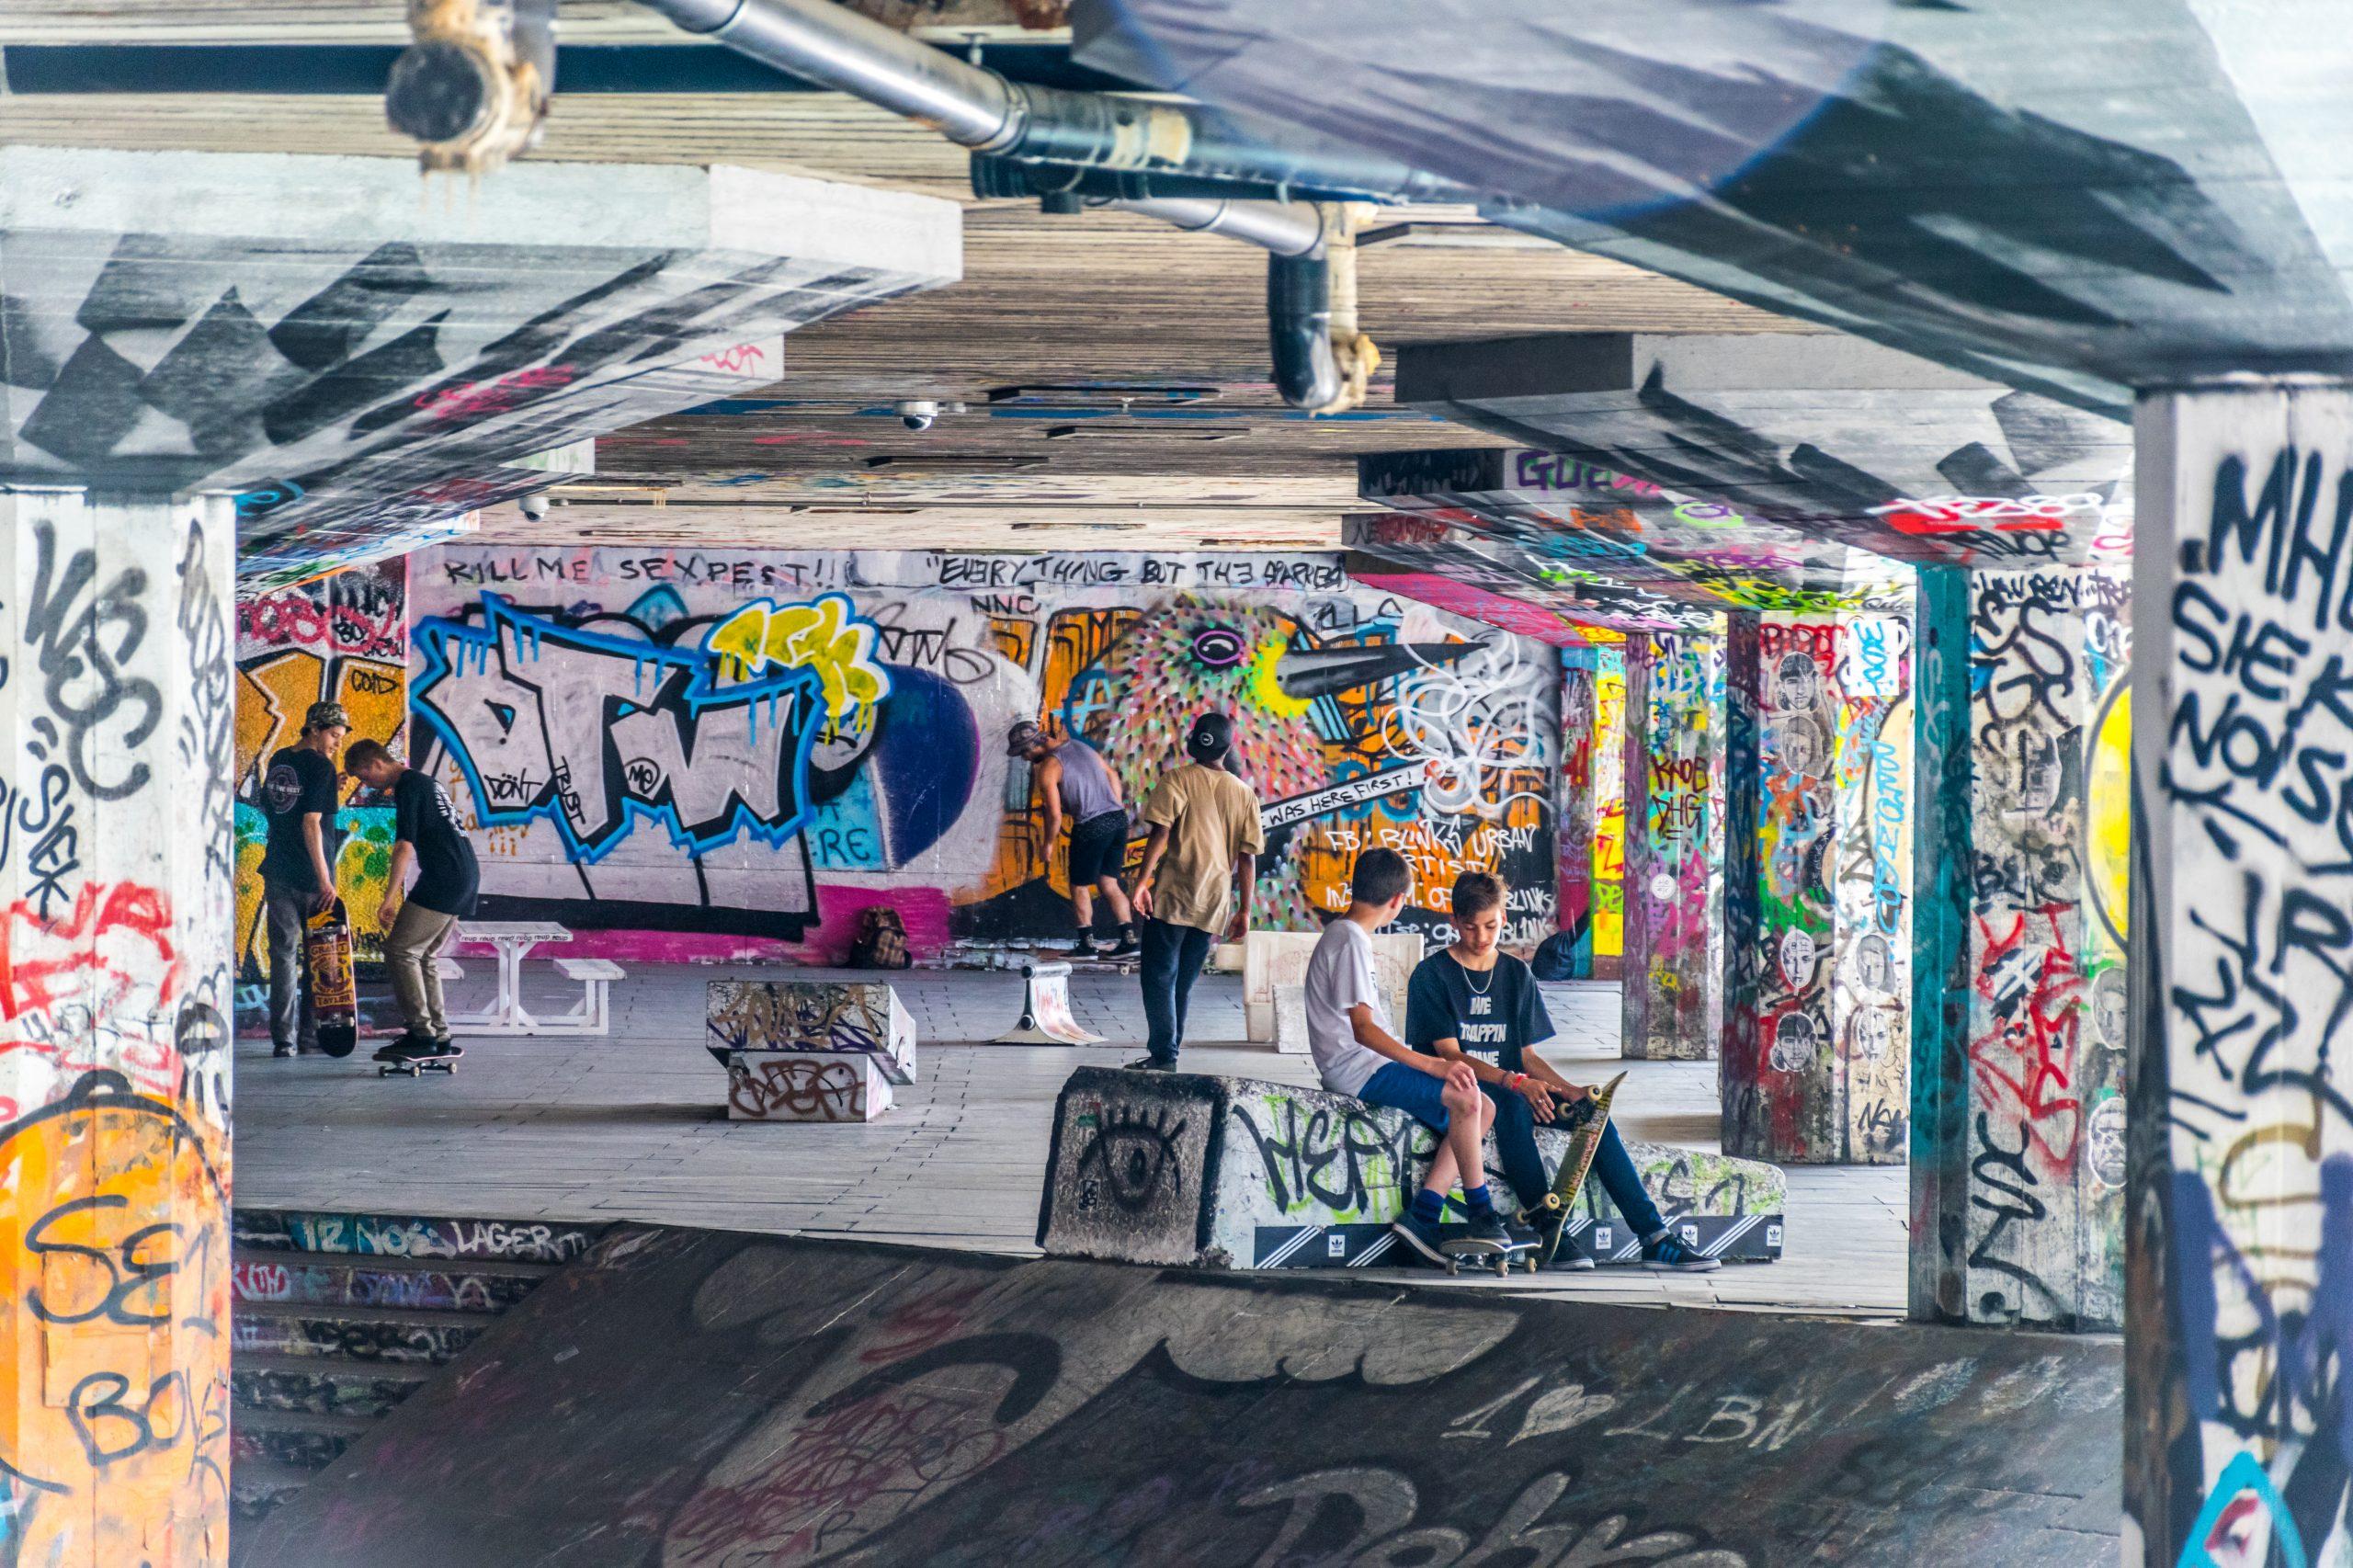 Southbank Skate Park London